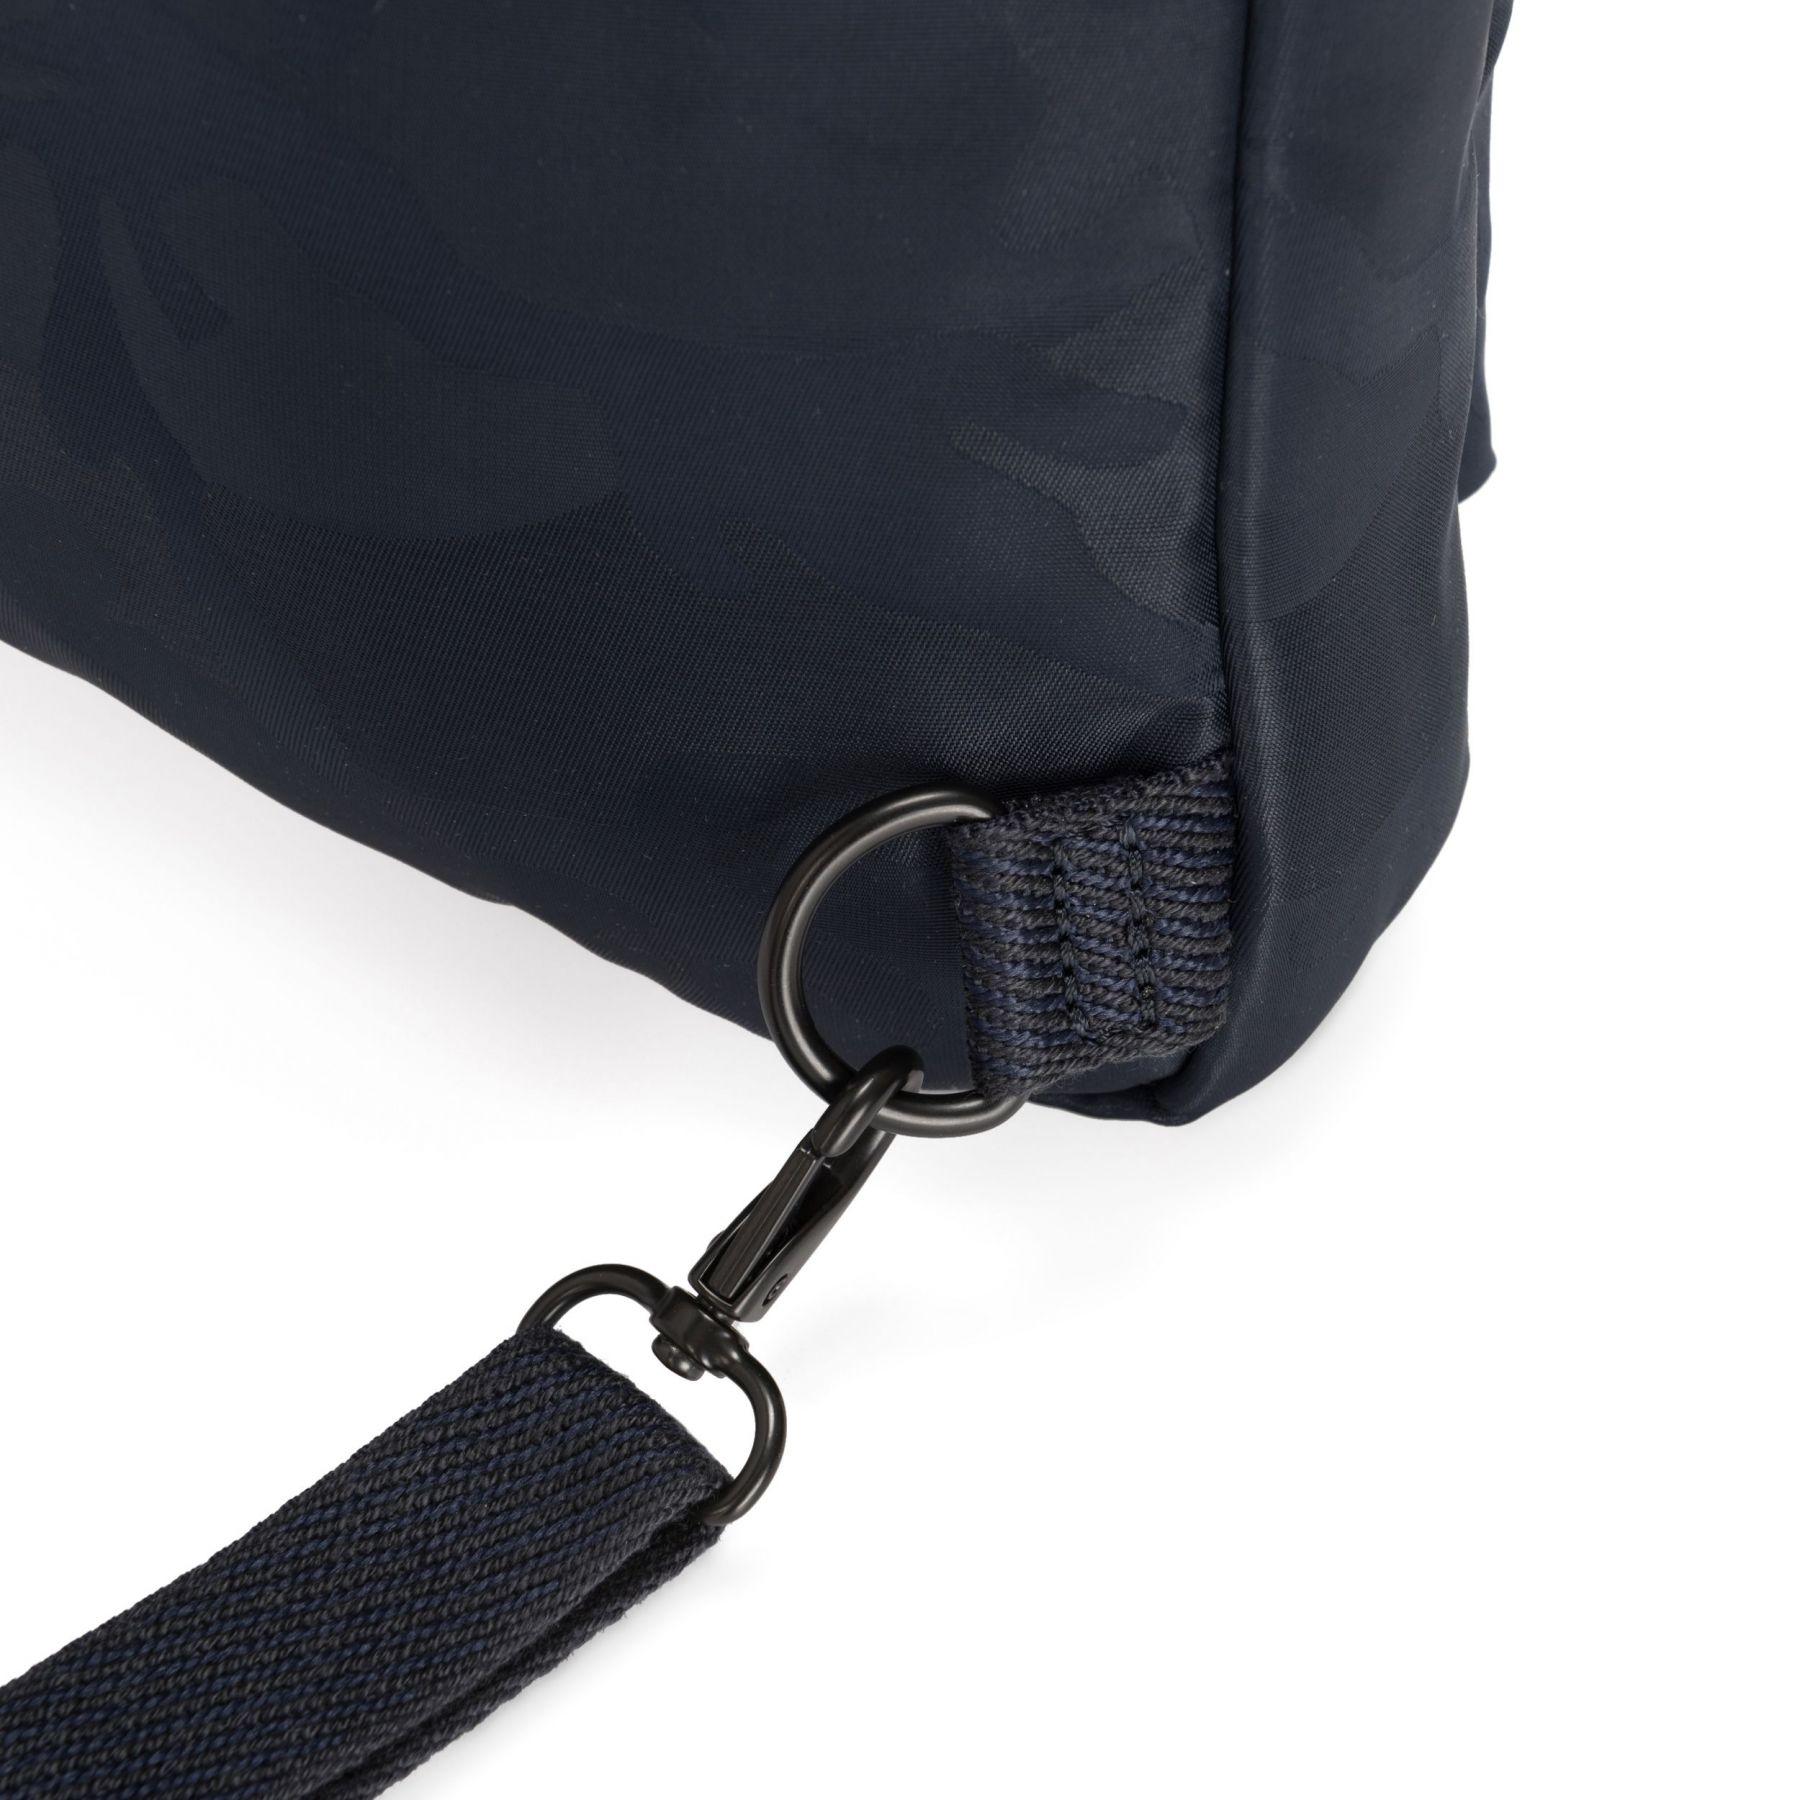 KOMORI S Latest Backpacks by Kipling